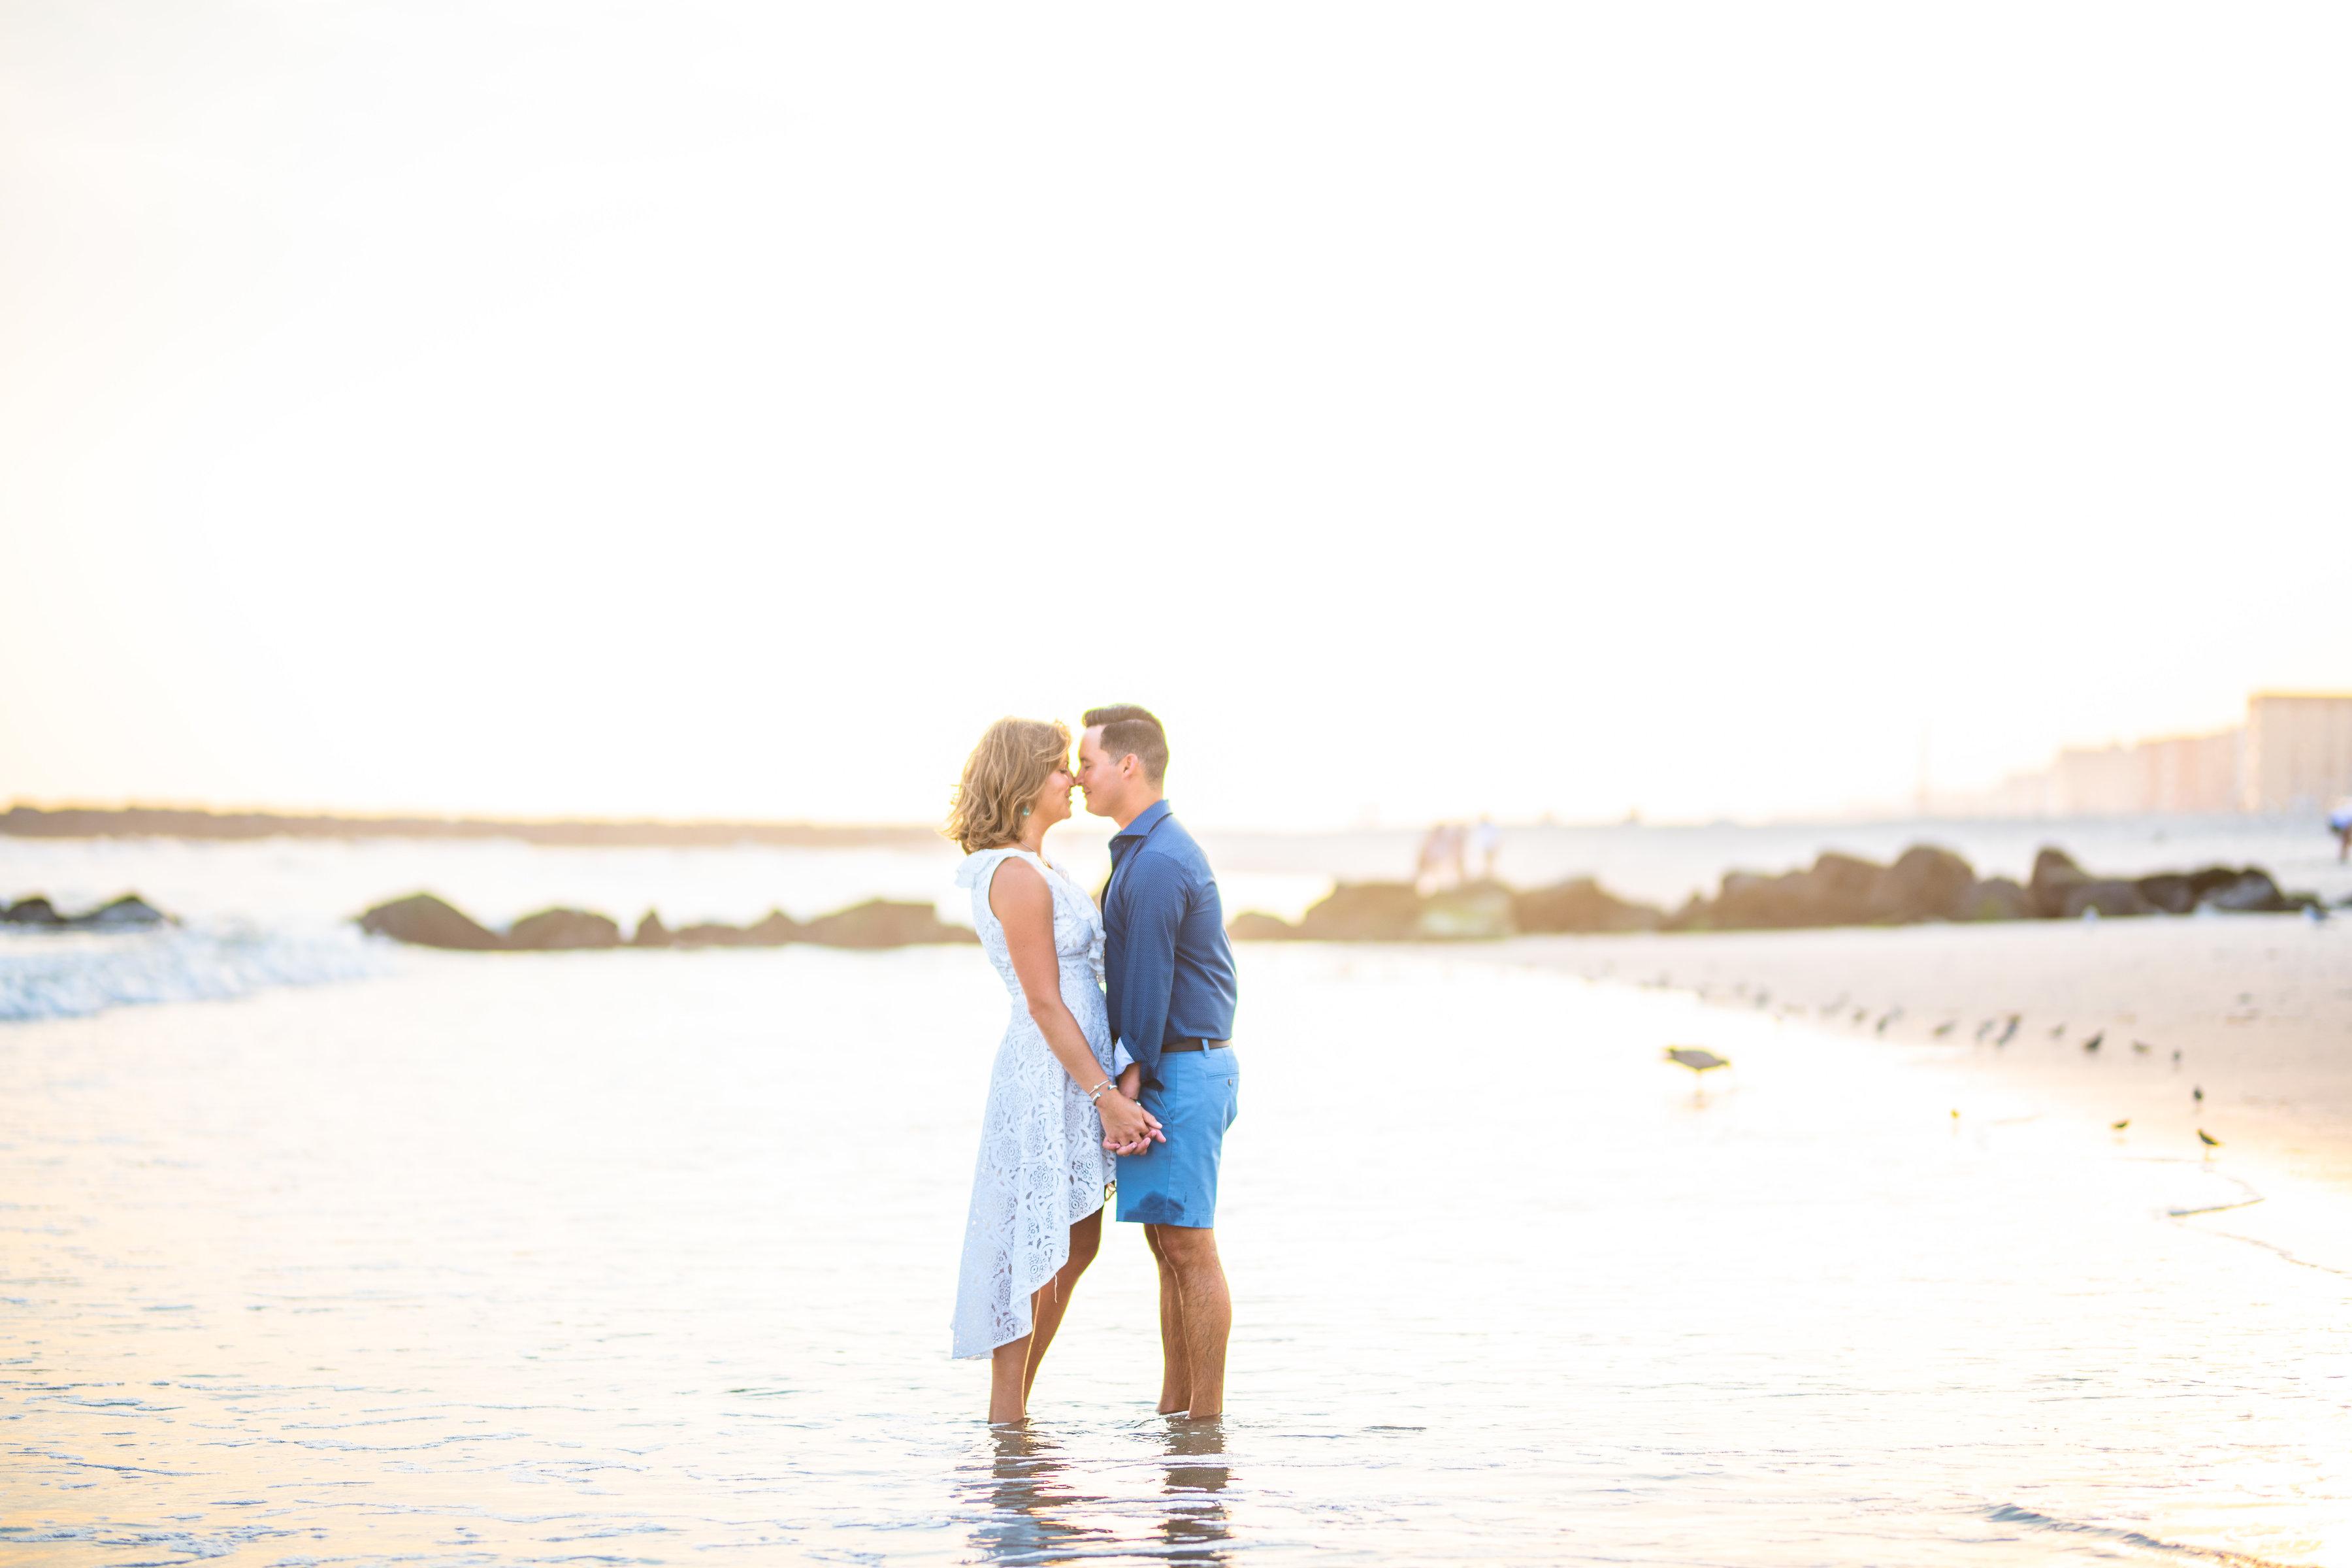 Long Beach NY Engagement Shoot | Long Beach Boardwalk Engagement Shoot | Long Island Wedding Photographer 4